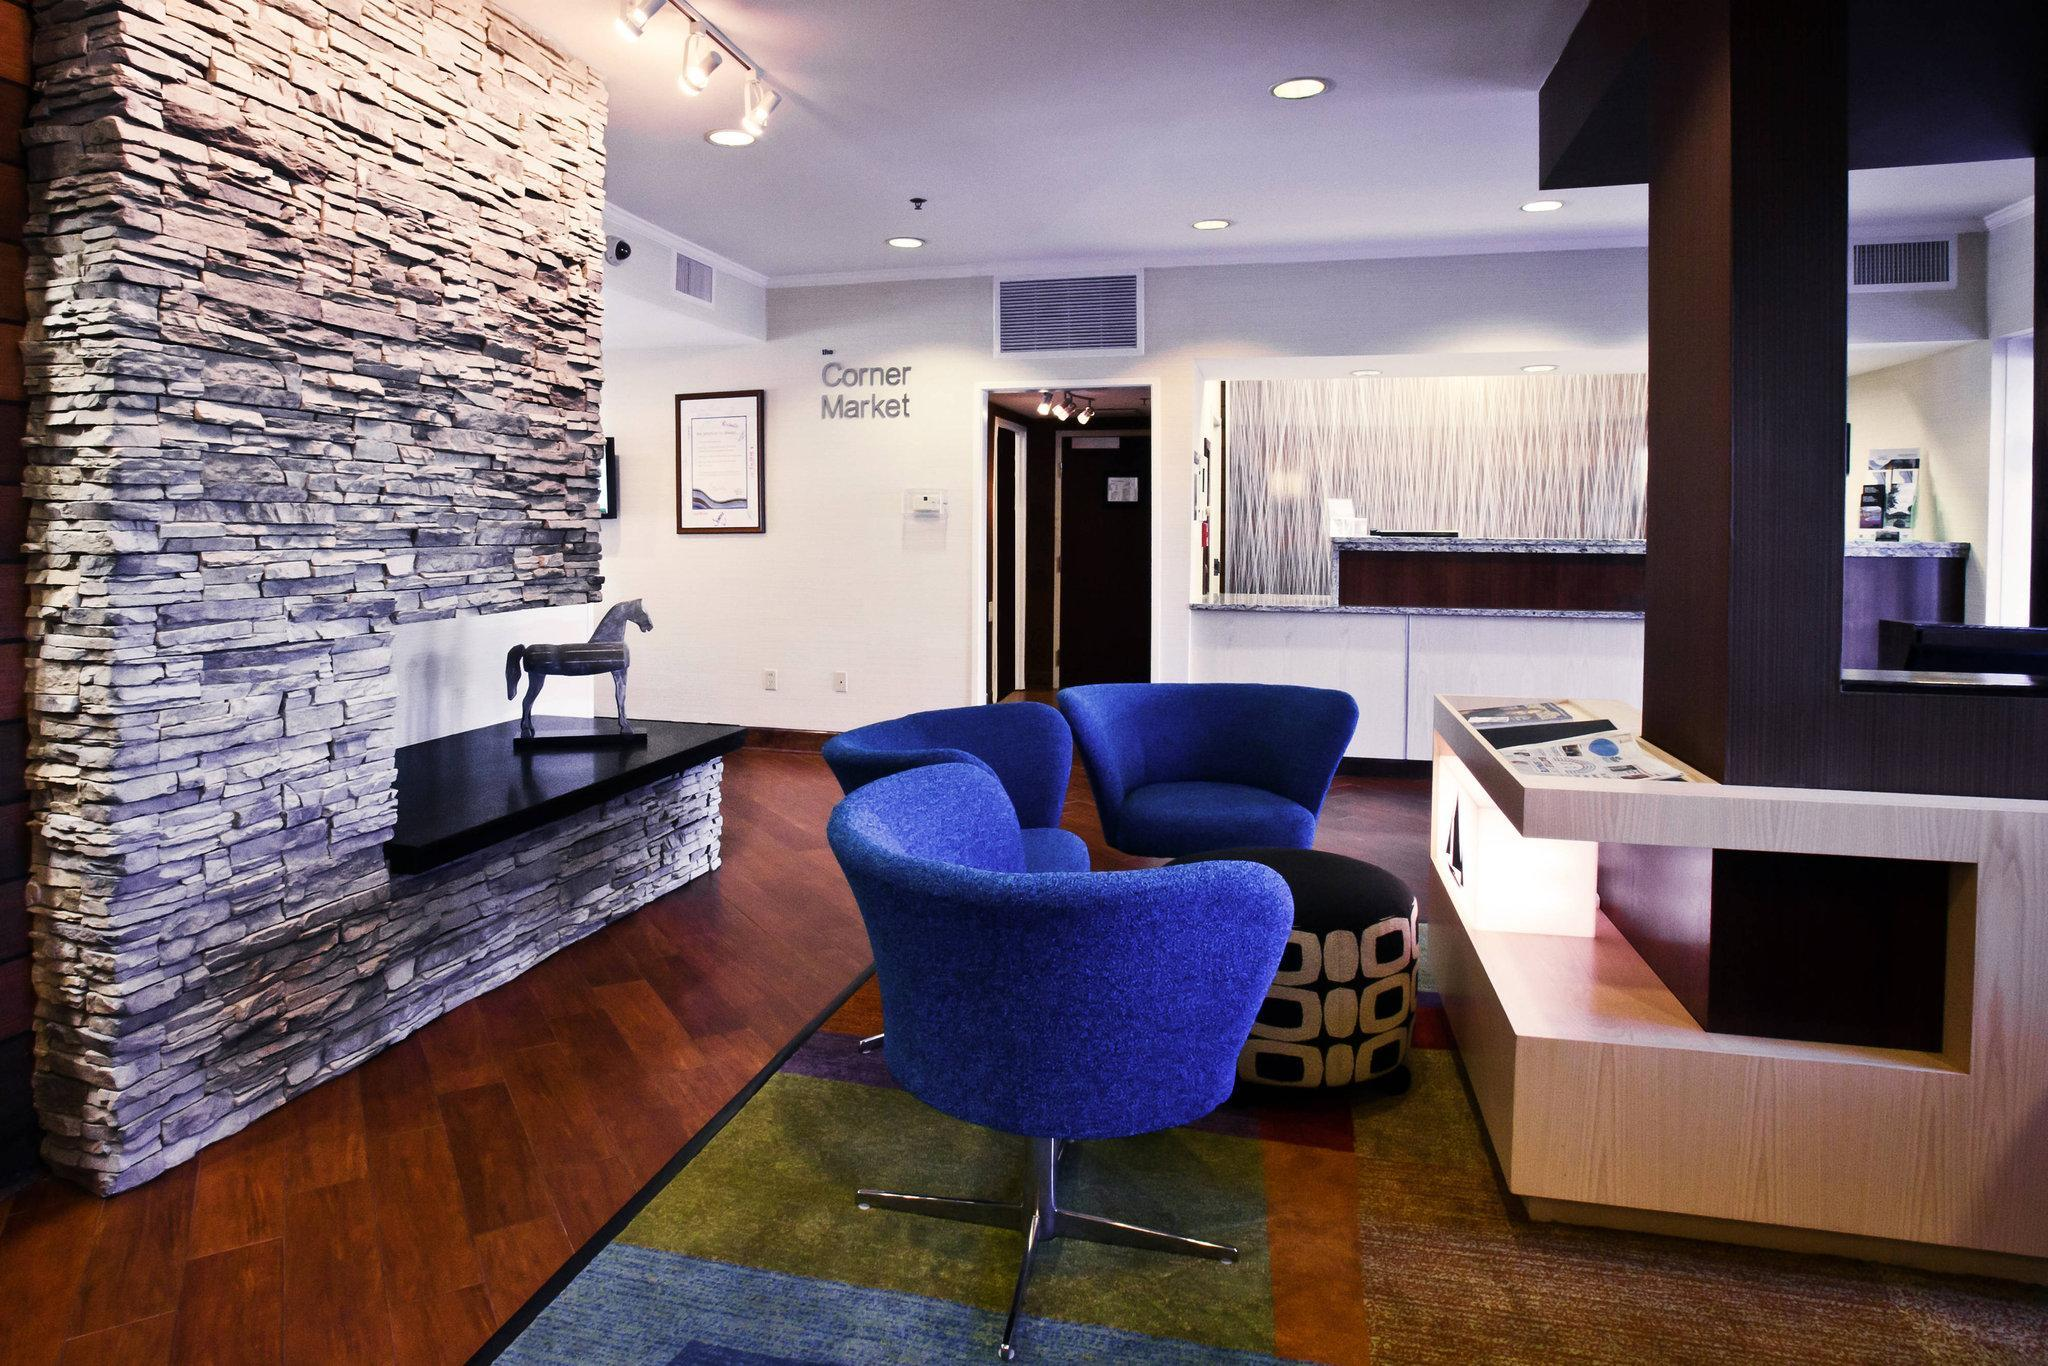 Fairfield Inn And Suites Savannah Airport